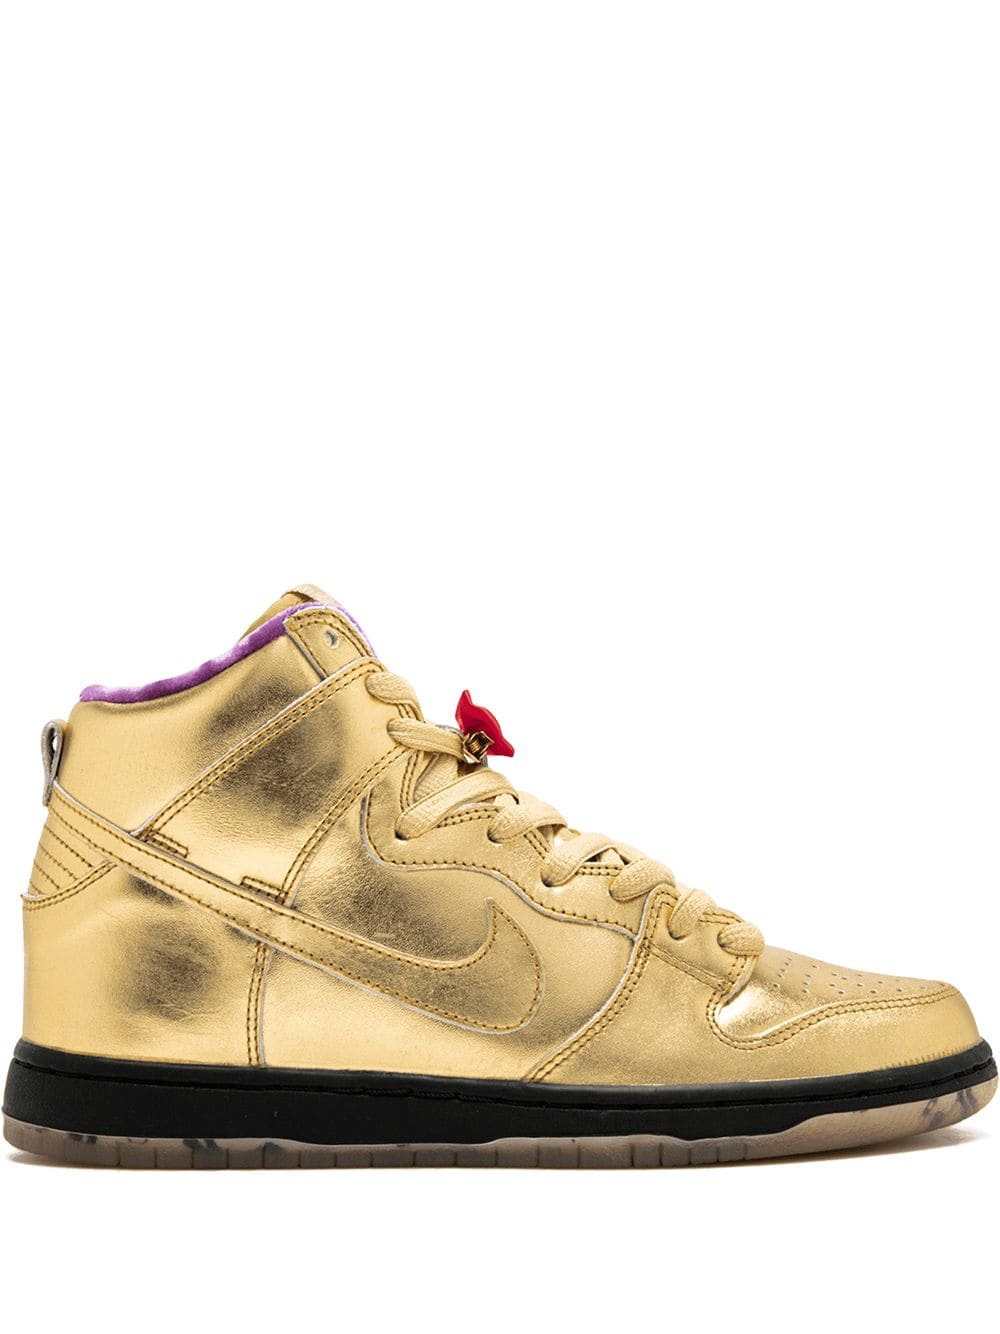 various colors ff0e4 6dbb7 Nike  Sb Dunk High Qs  Sneakers - Gold